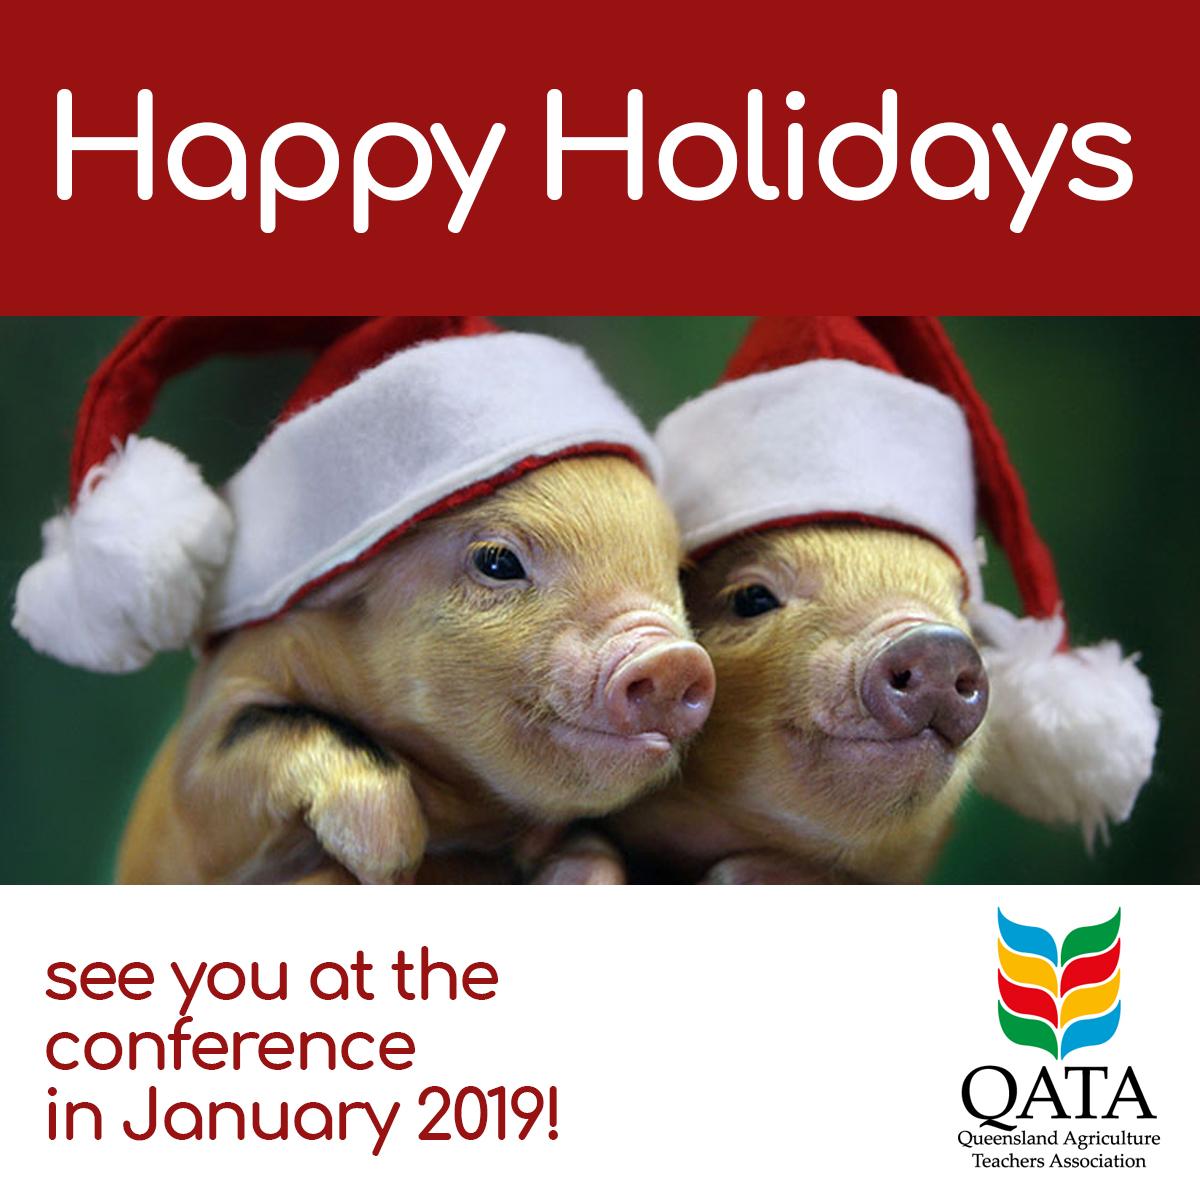 insta_fb_holidays_QATA